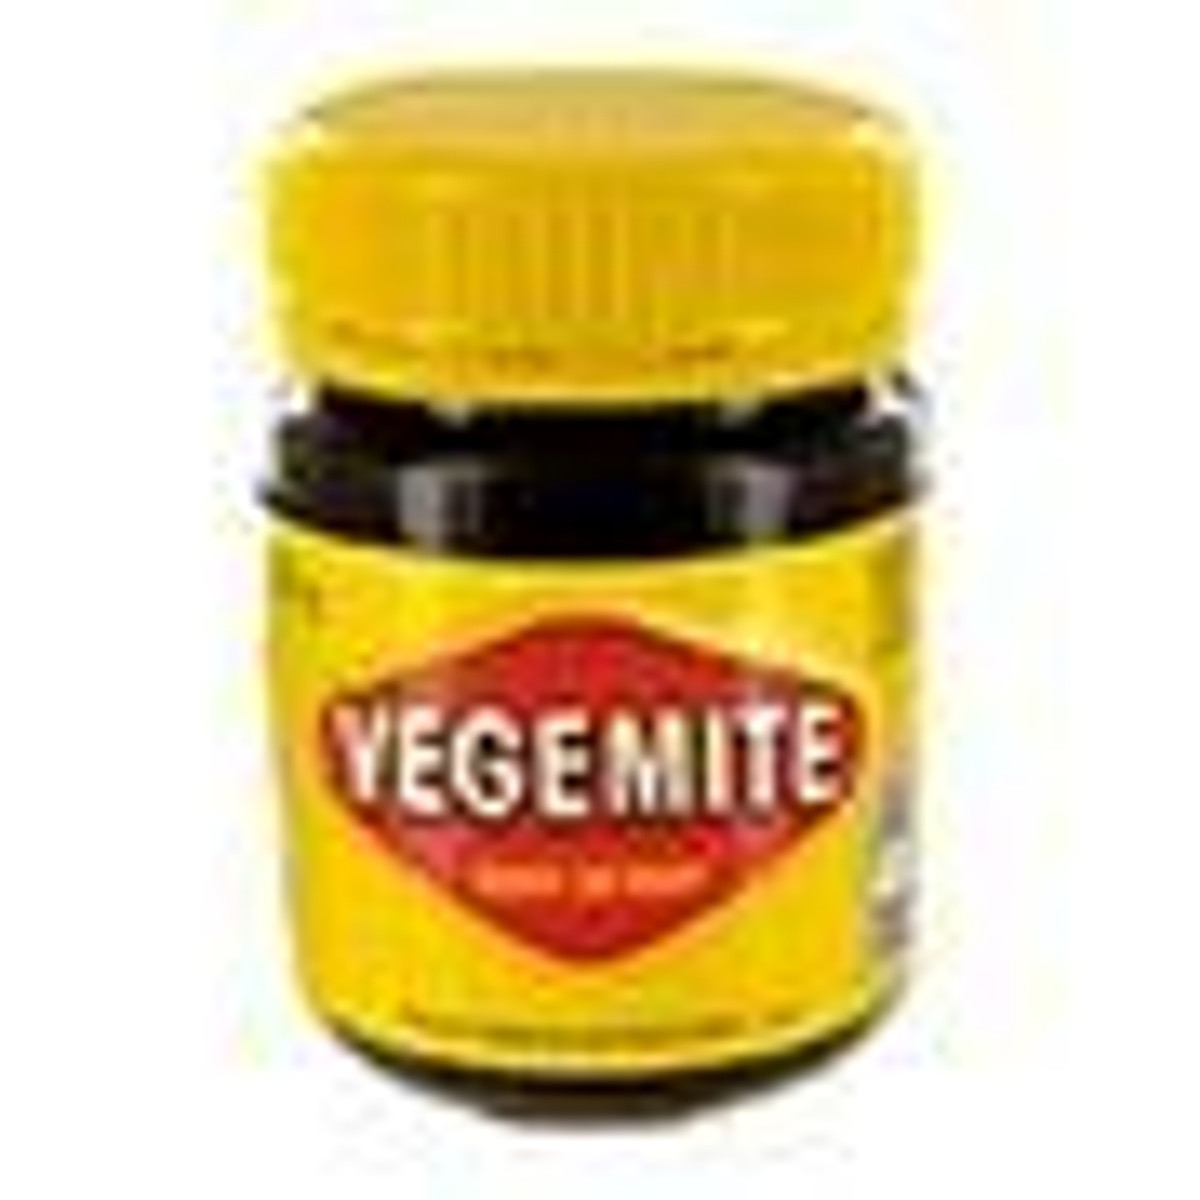 Vegemite & Marmite